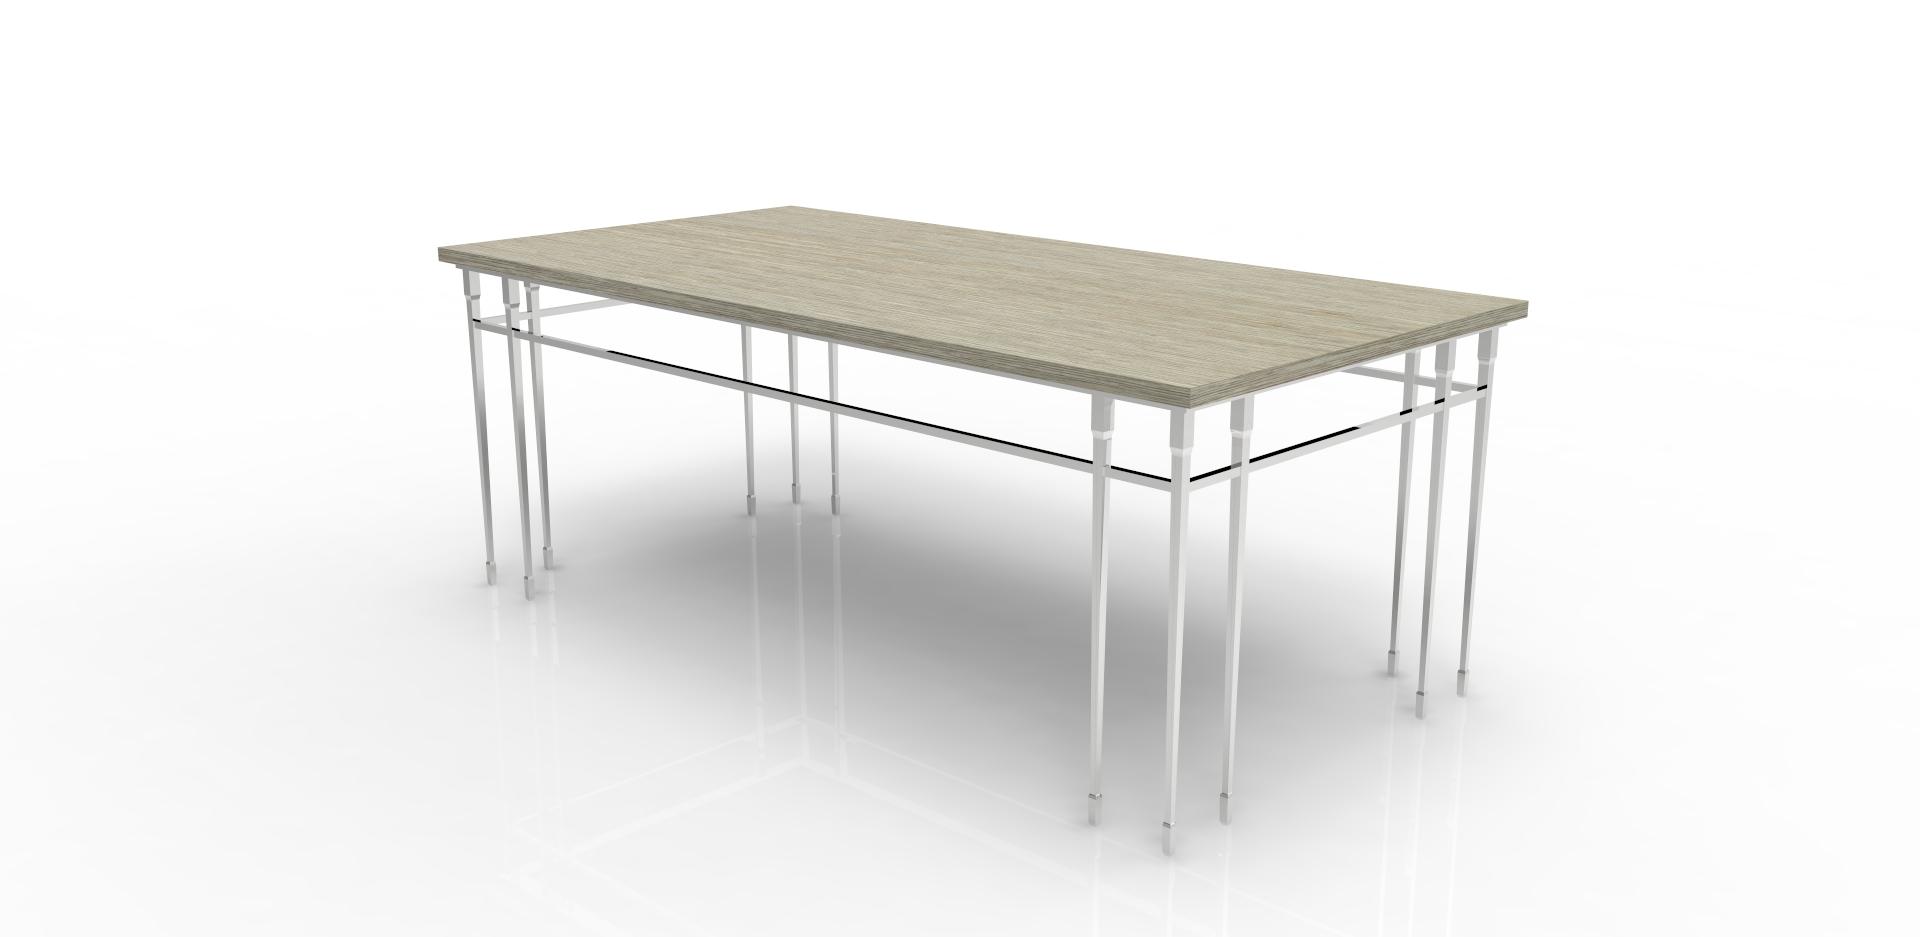 Кухонный стол M-Style 15434883 от thefurnish